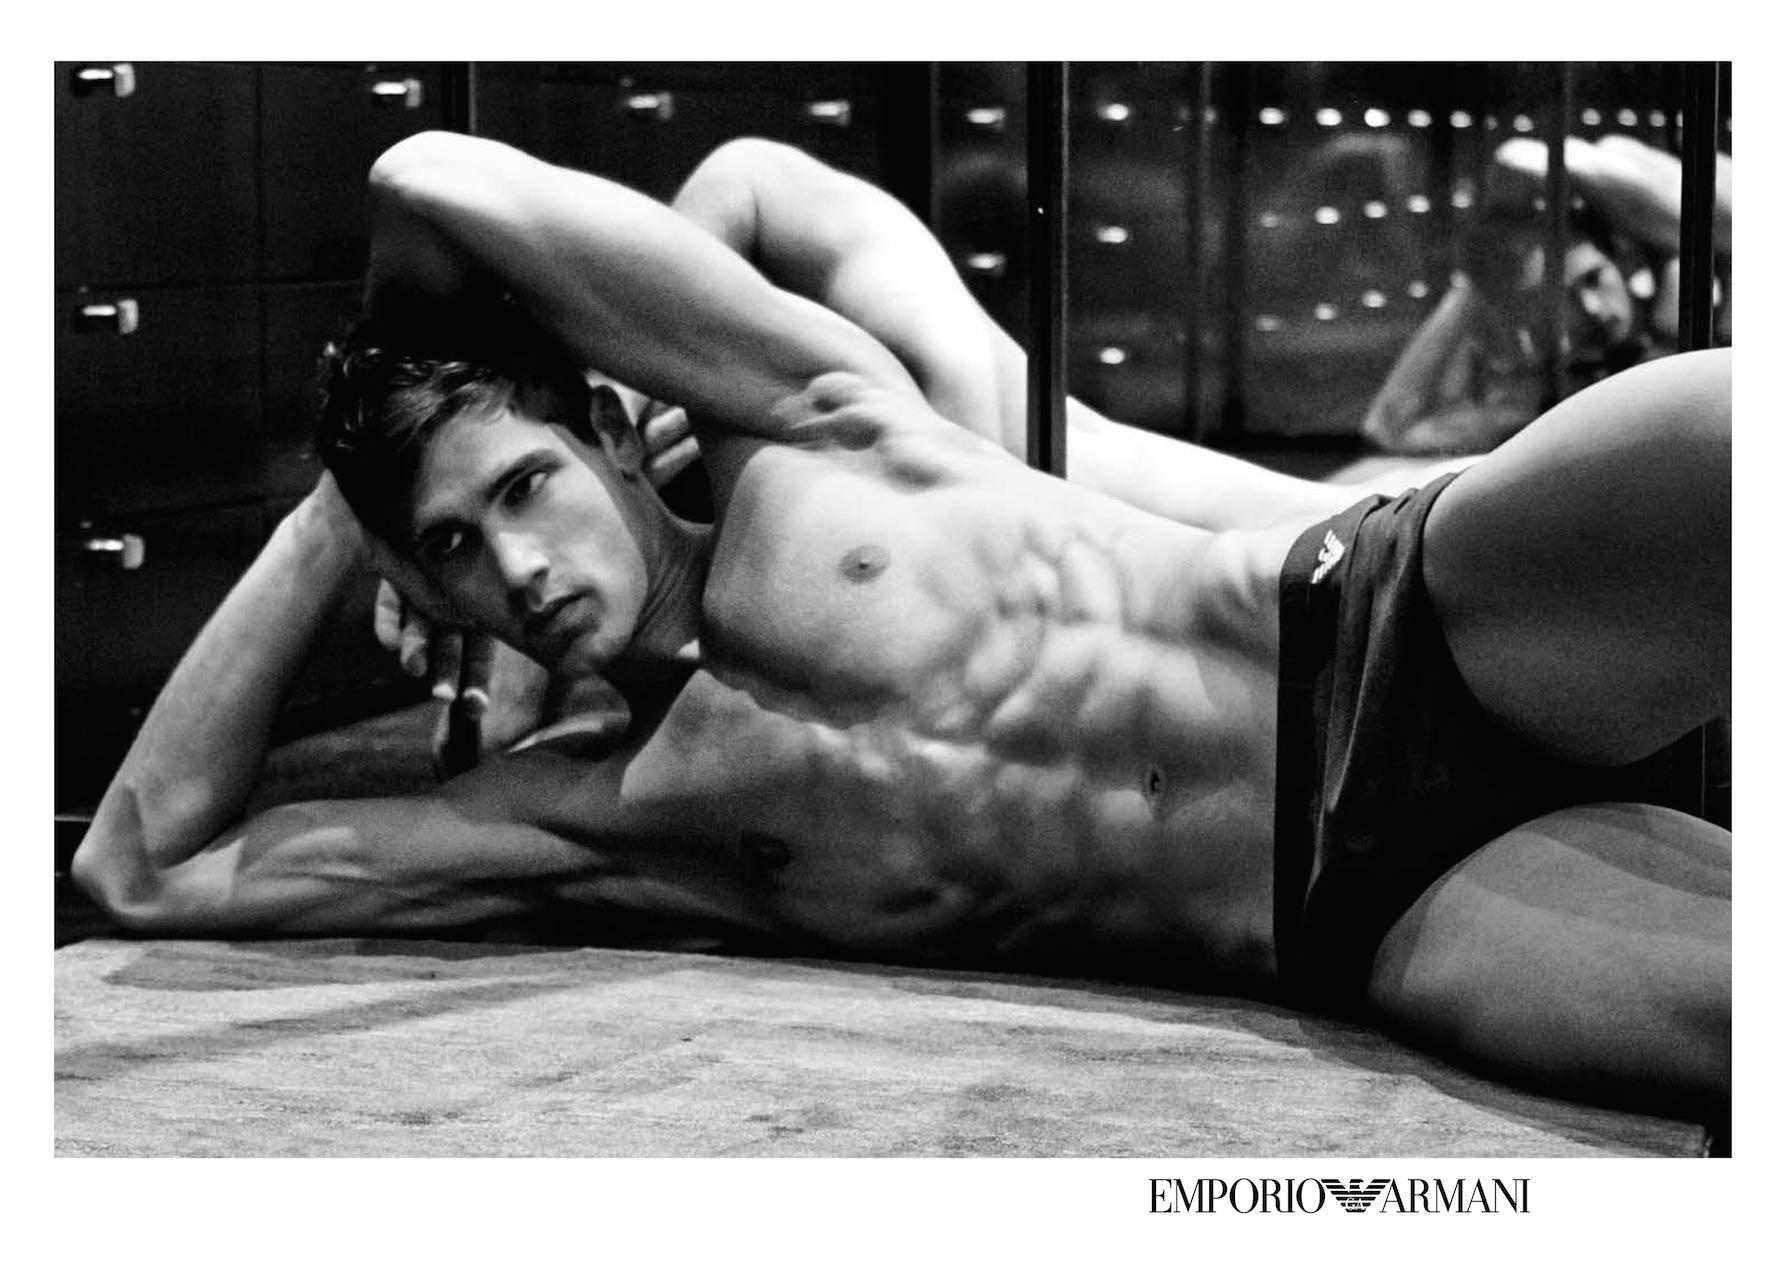 ea_underwear_fw14-15_adv-final2